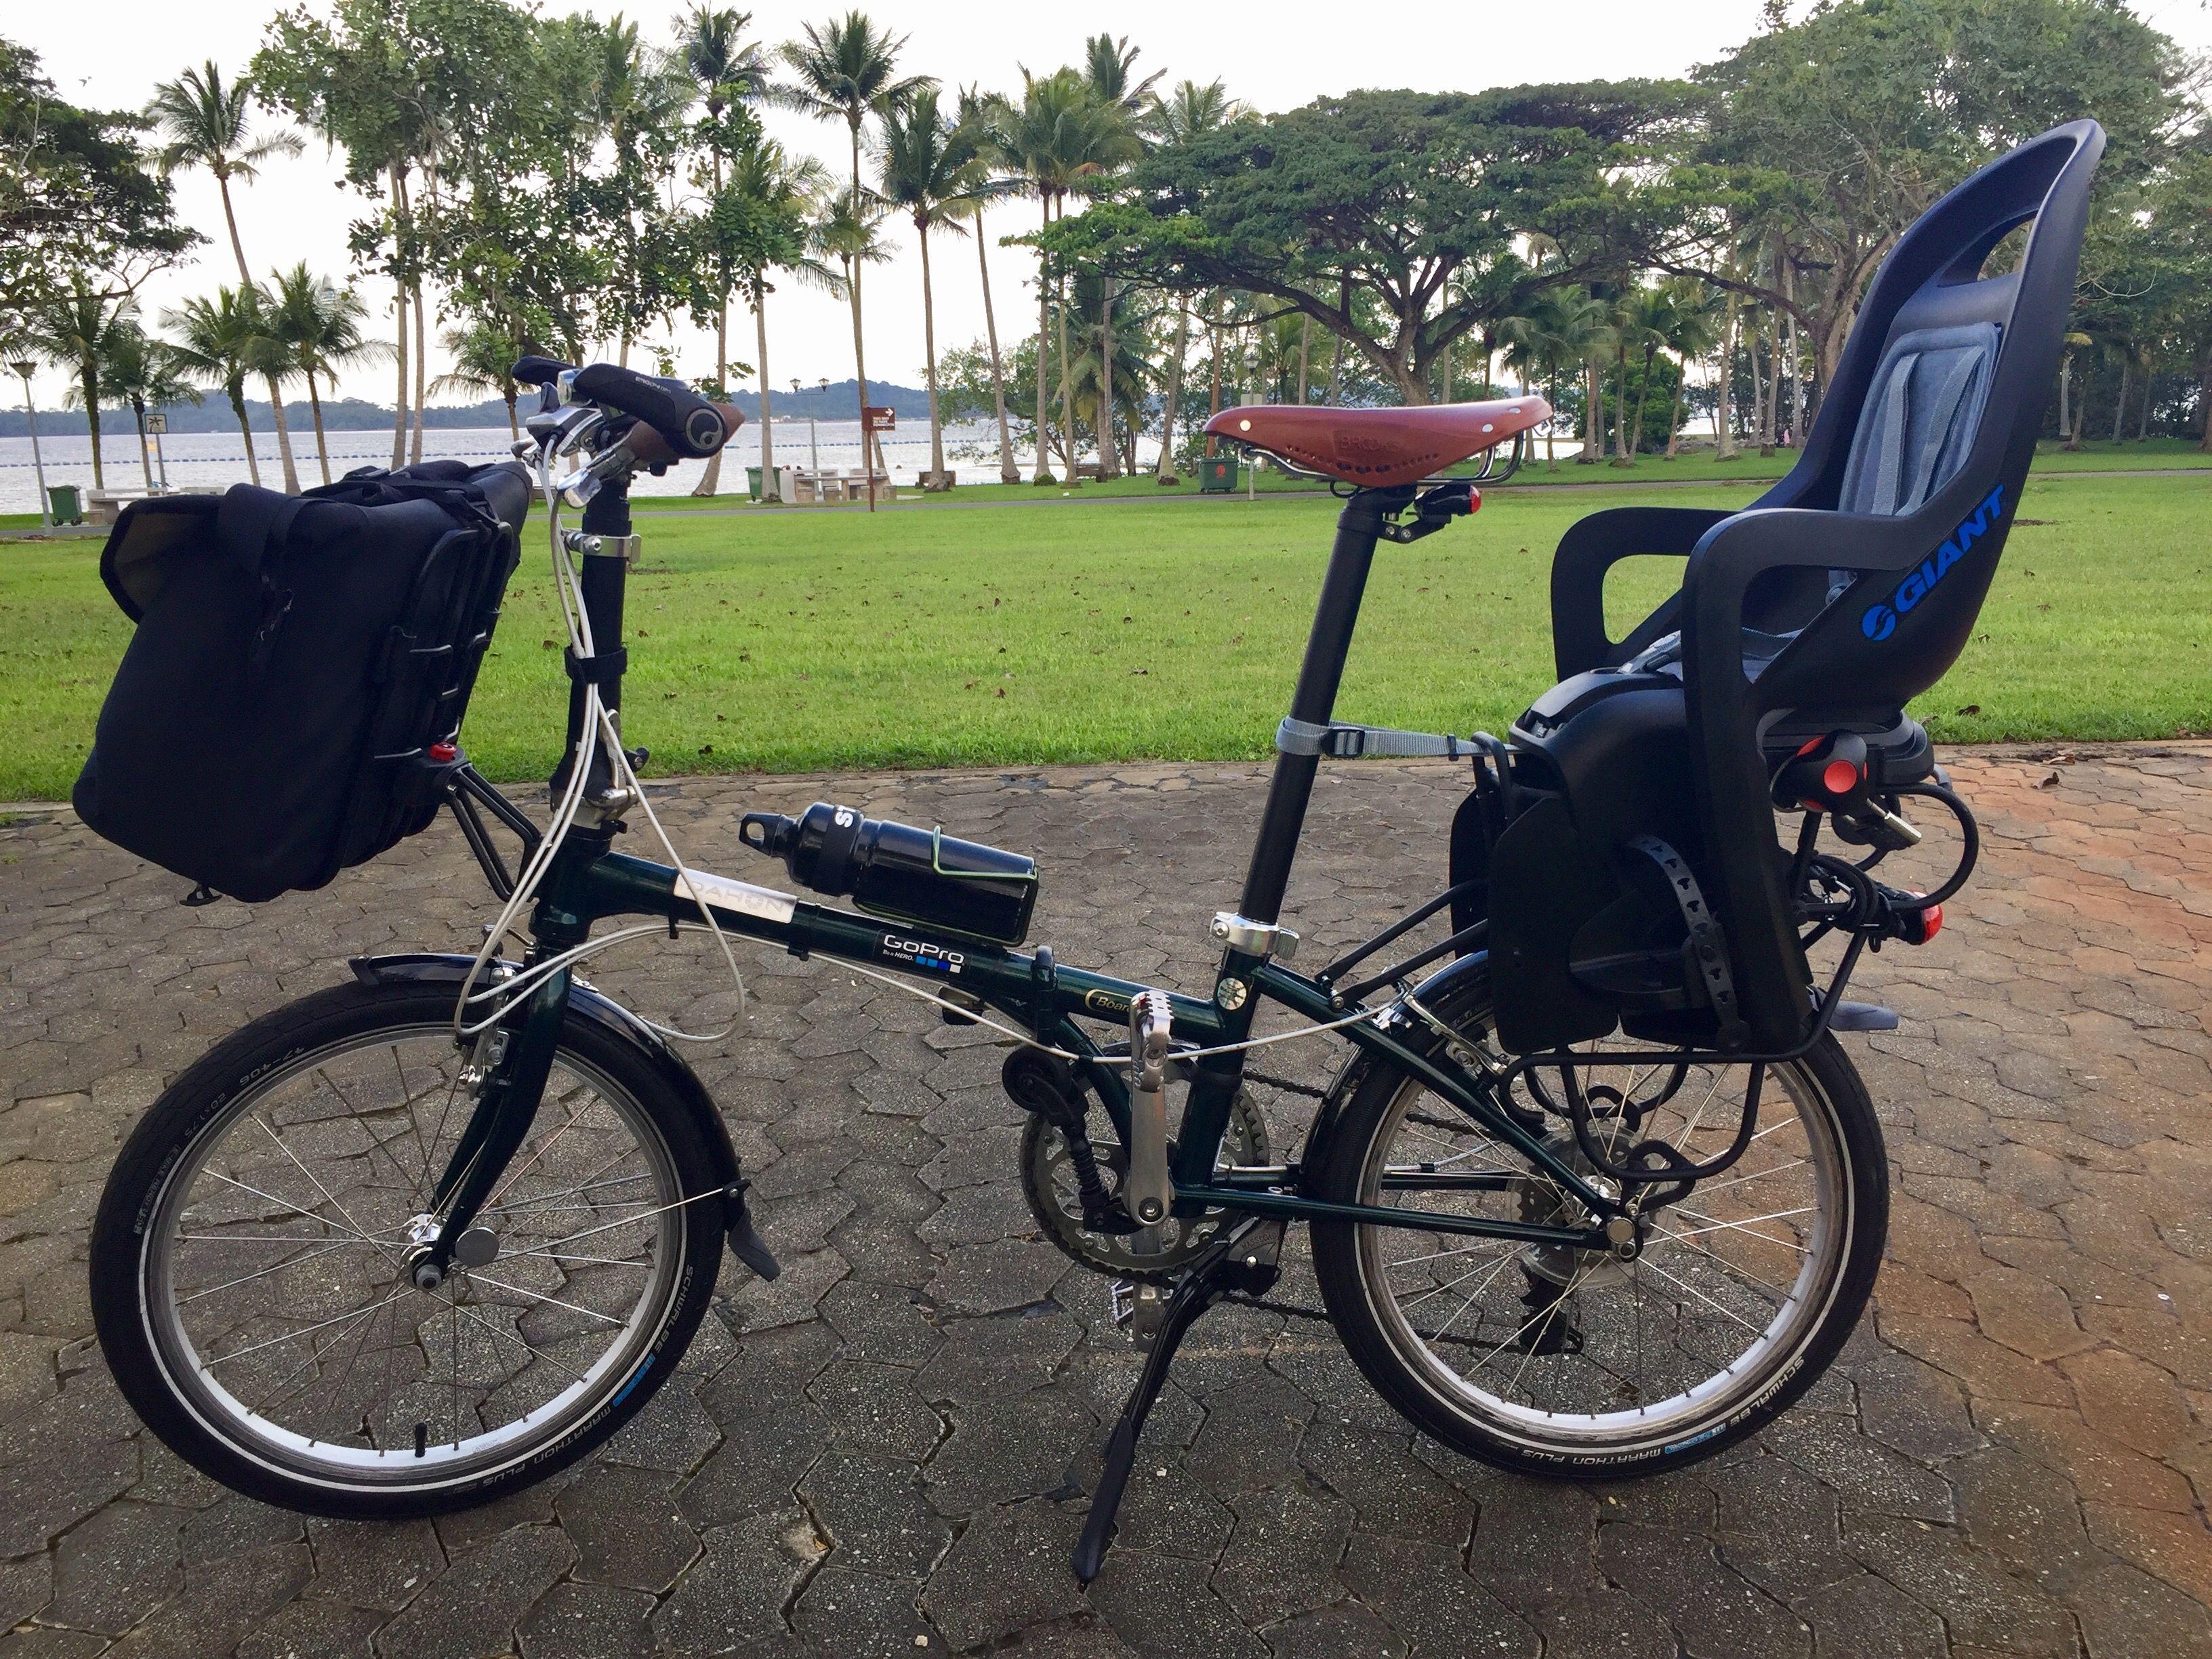 2e56ef89e1d Child seat on Dahon Boardwalk folding bike | Folding bike | Bike ...